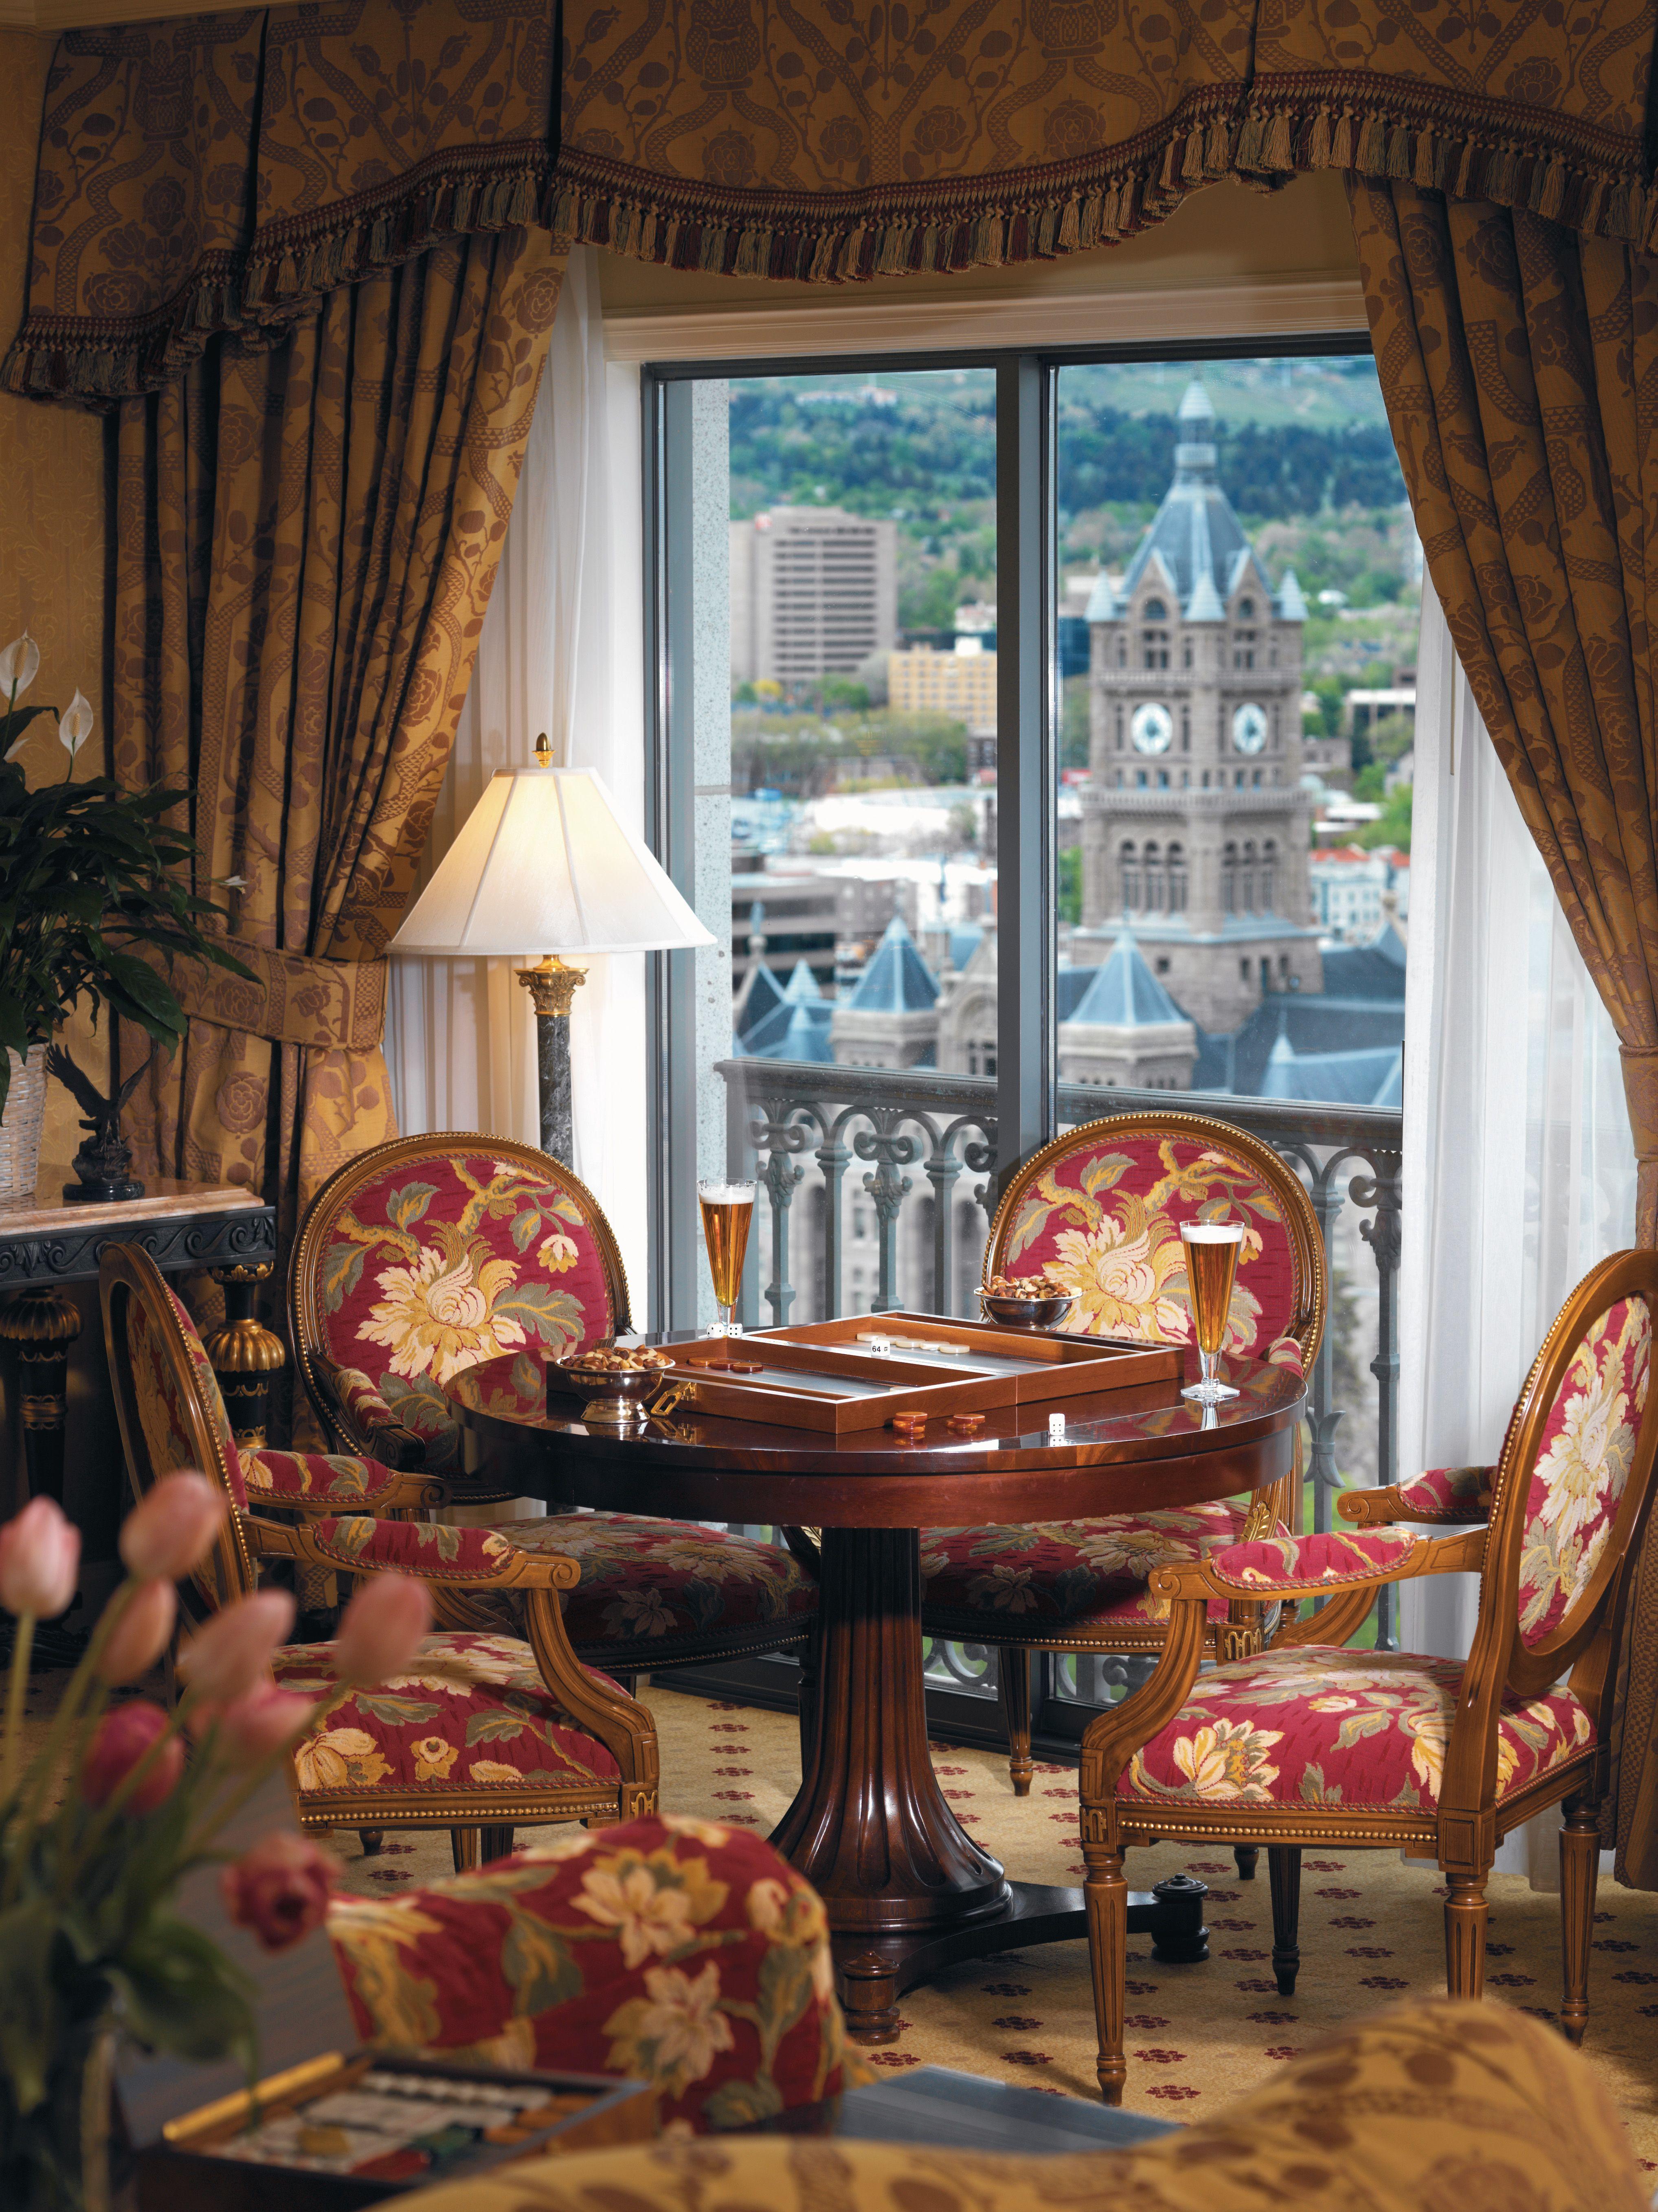 View from the Grand America Hotel Salt lake city ut